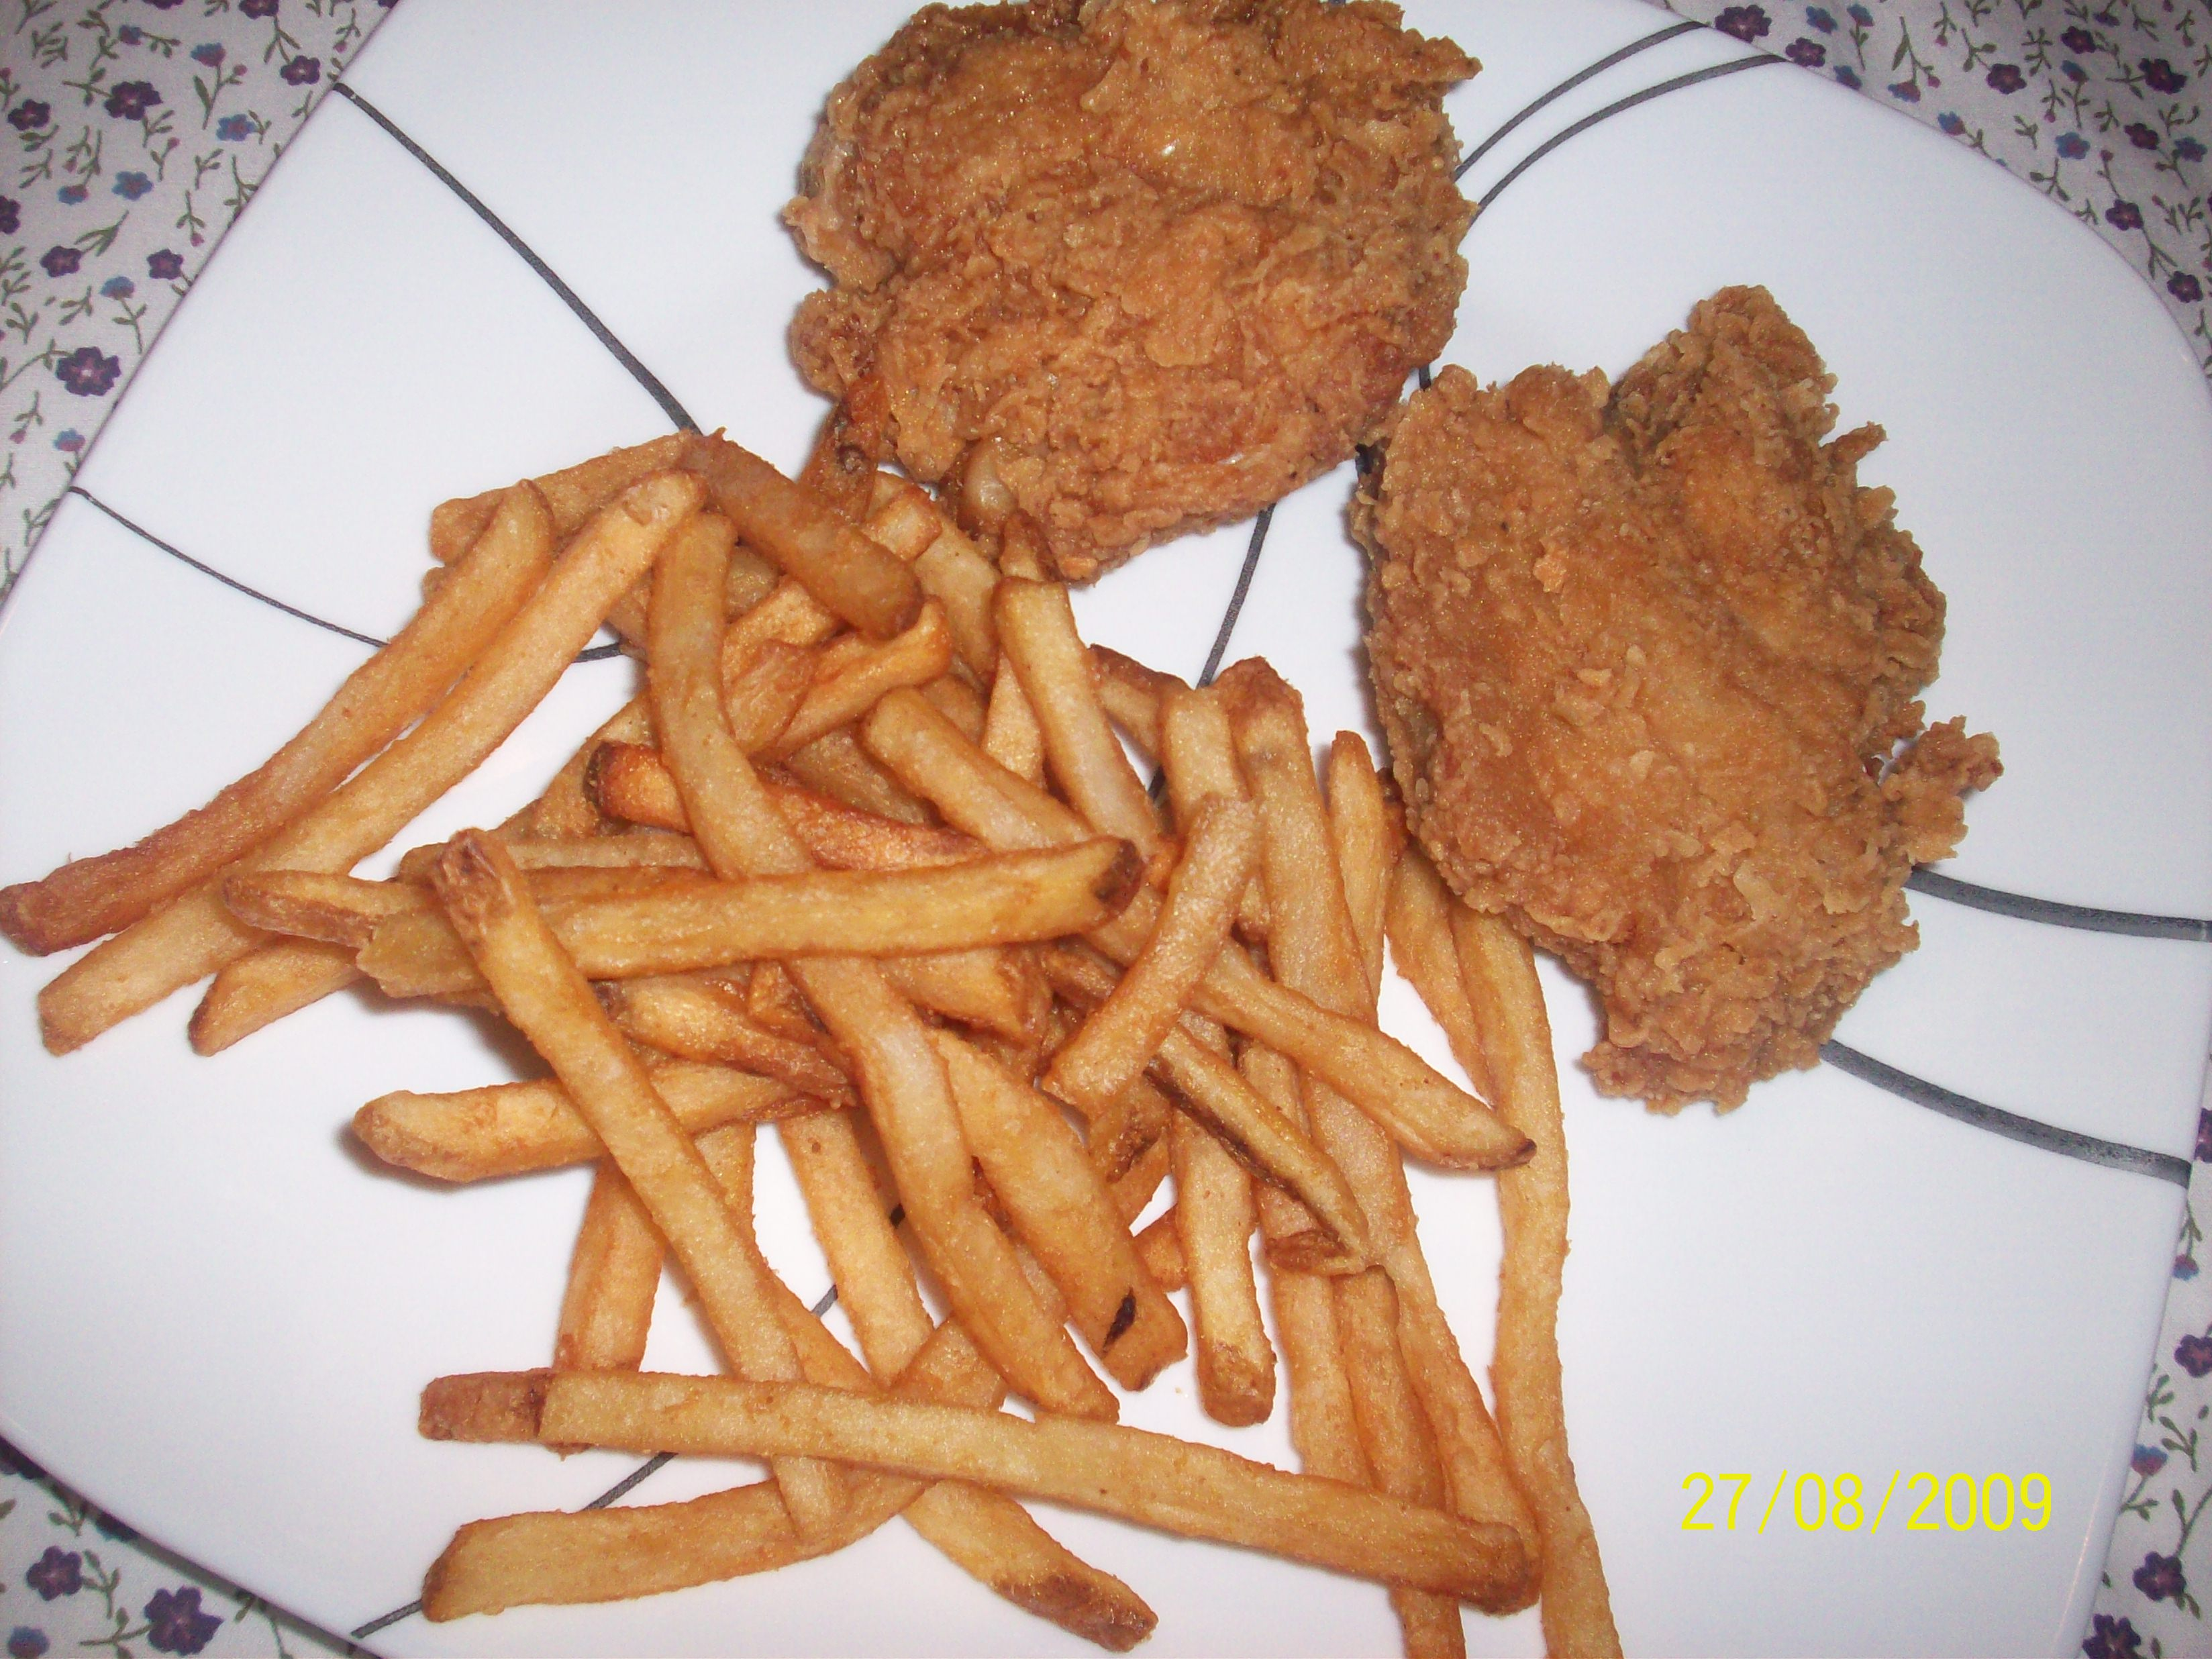 https://foodloader.net/cutie_2009-08-27_KFC_Chicken_and_Fries.jpg